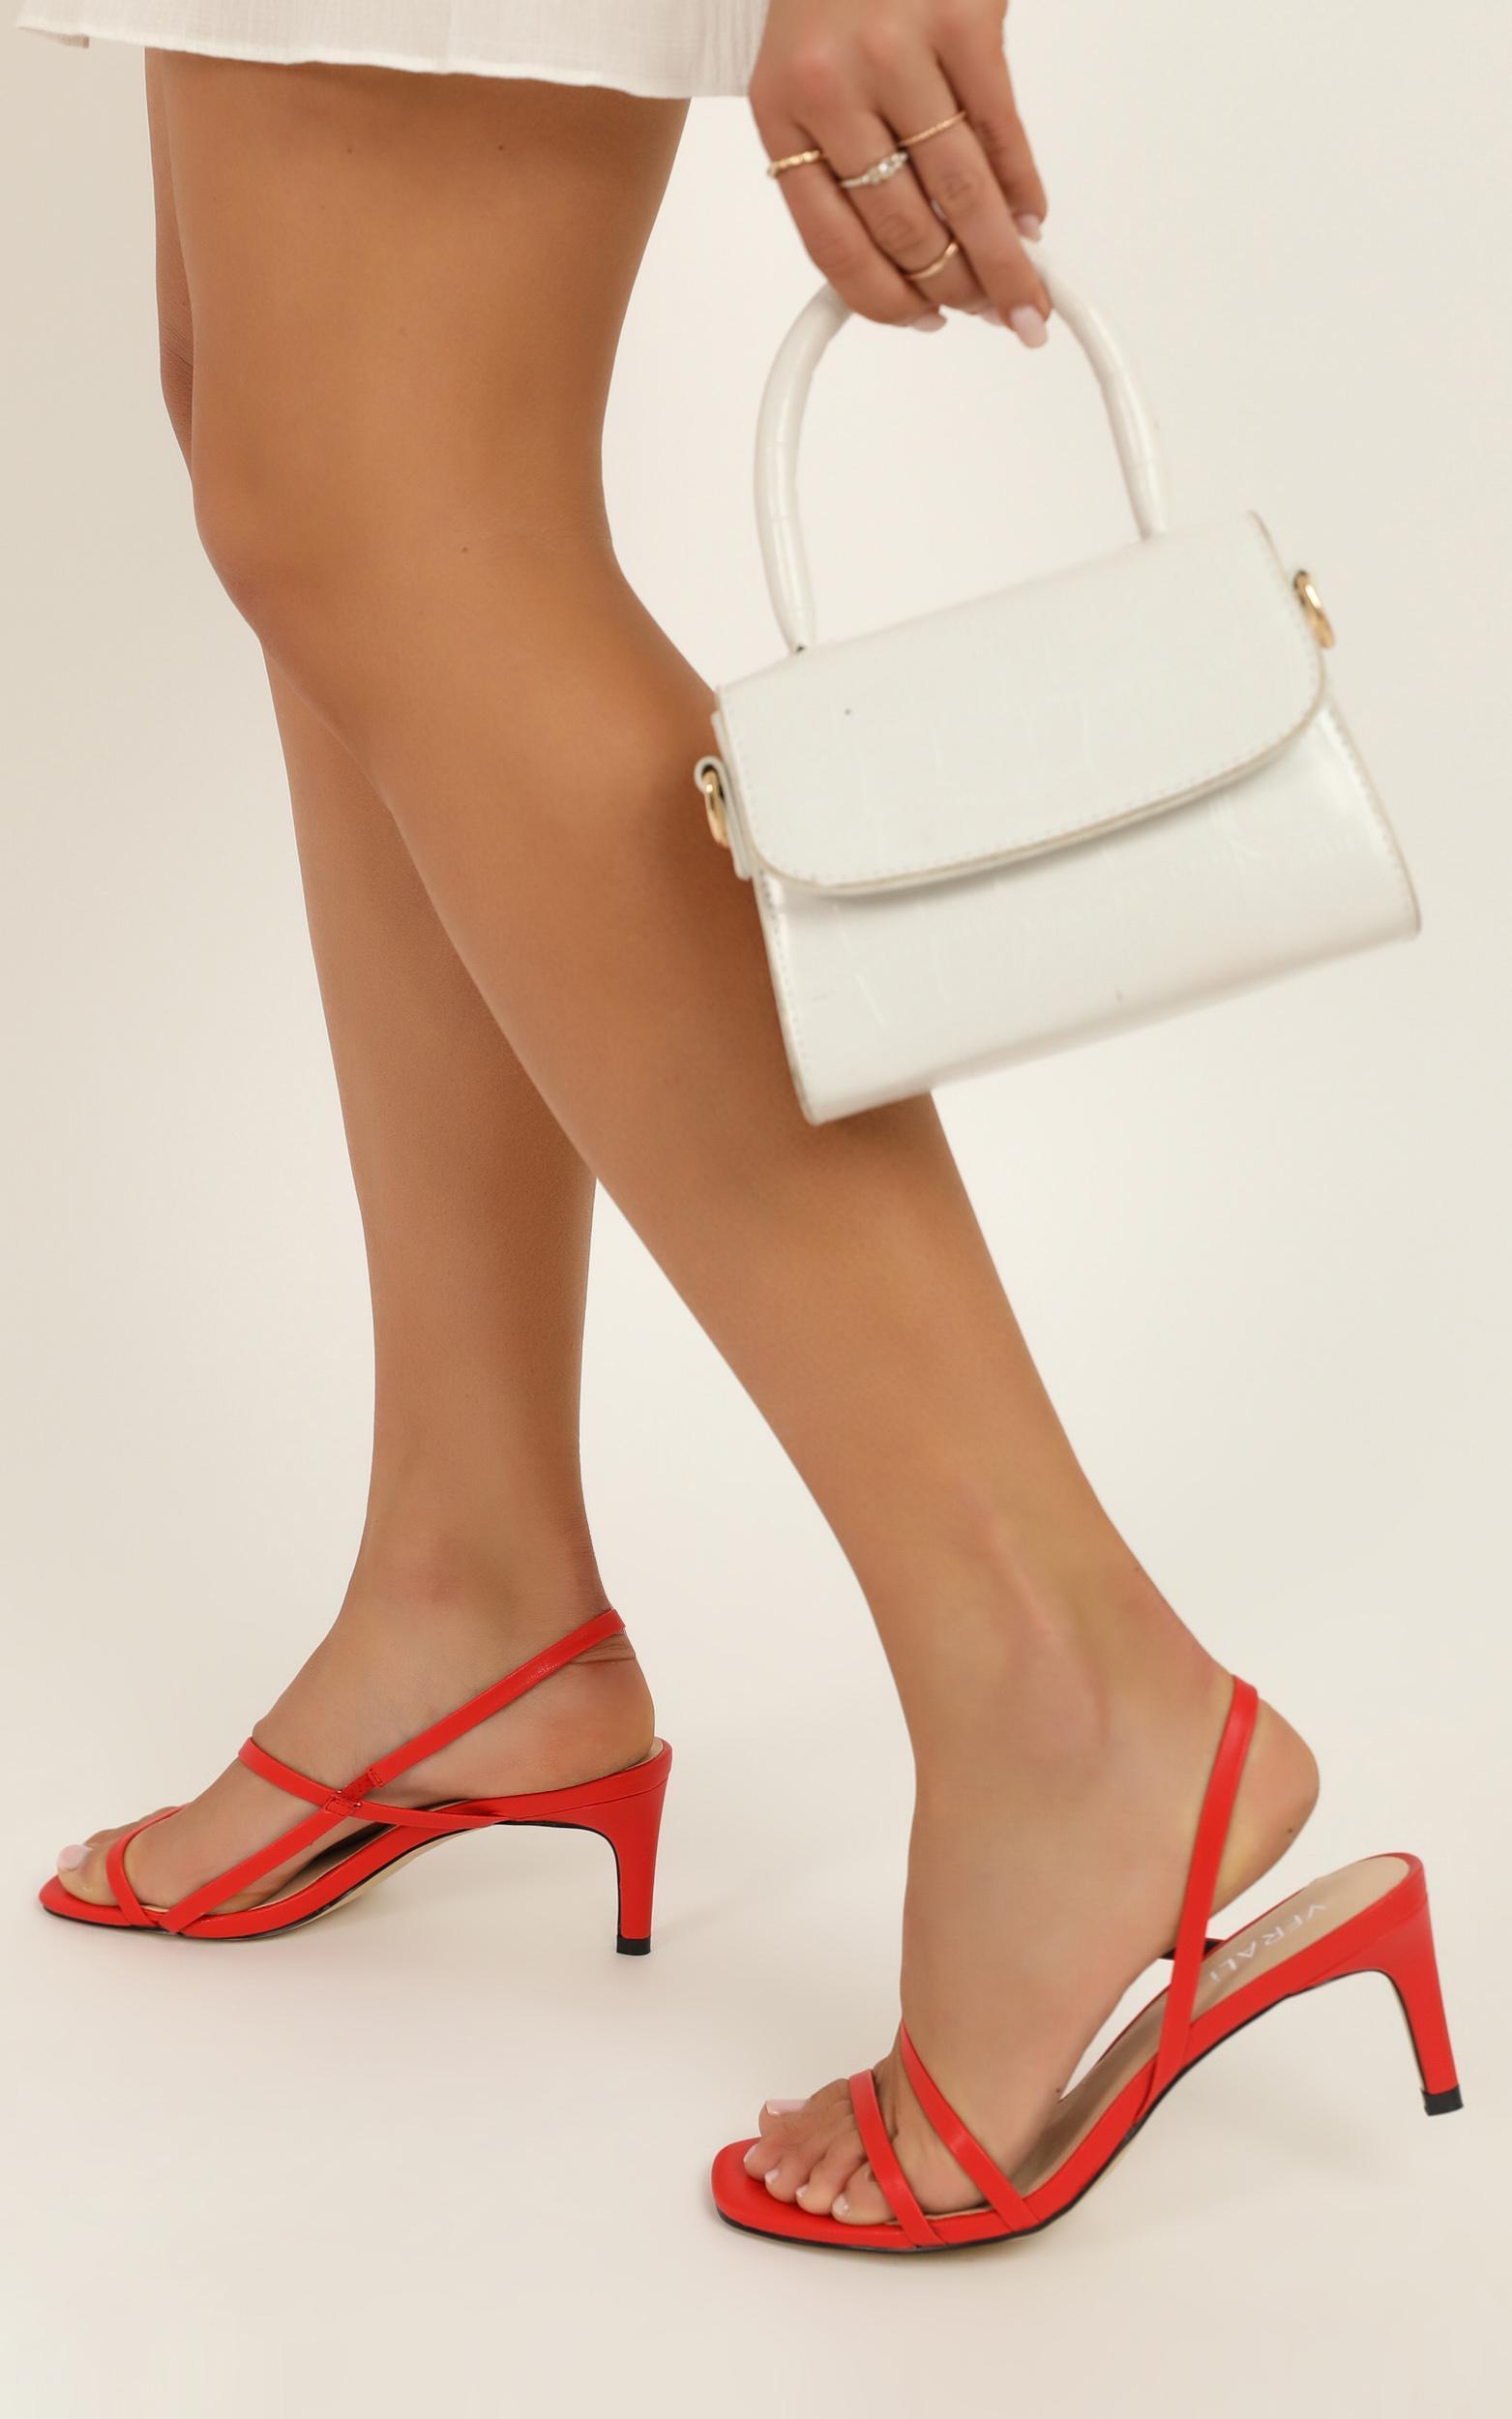 Verali - Valeria Heels in red smooth - 5, Red, hi-res image number null